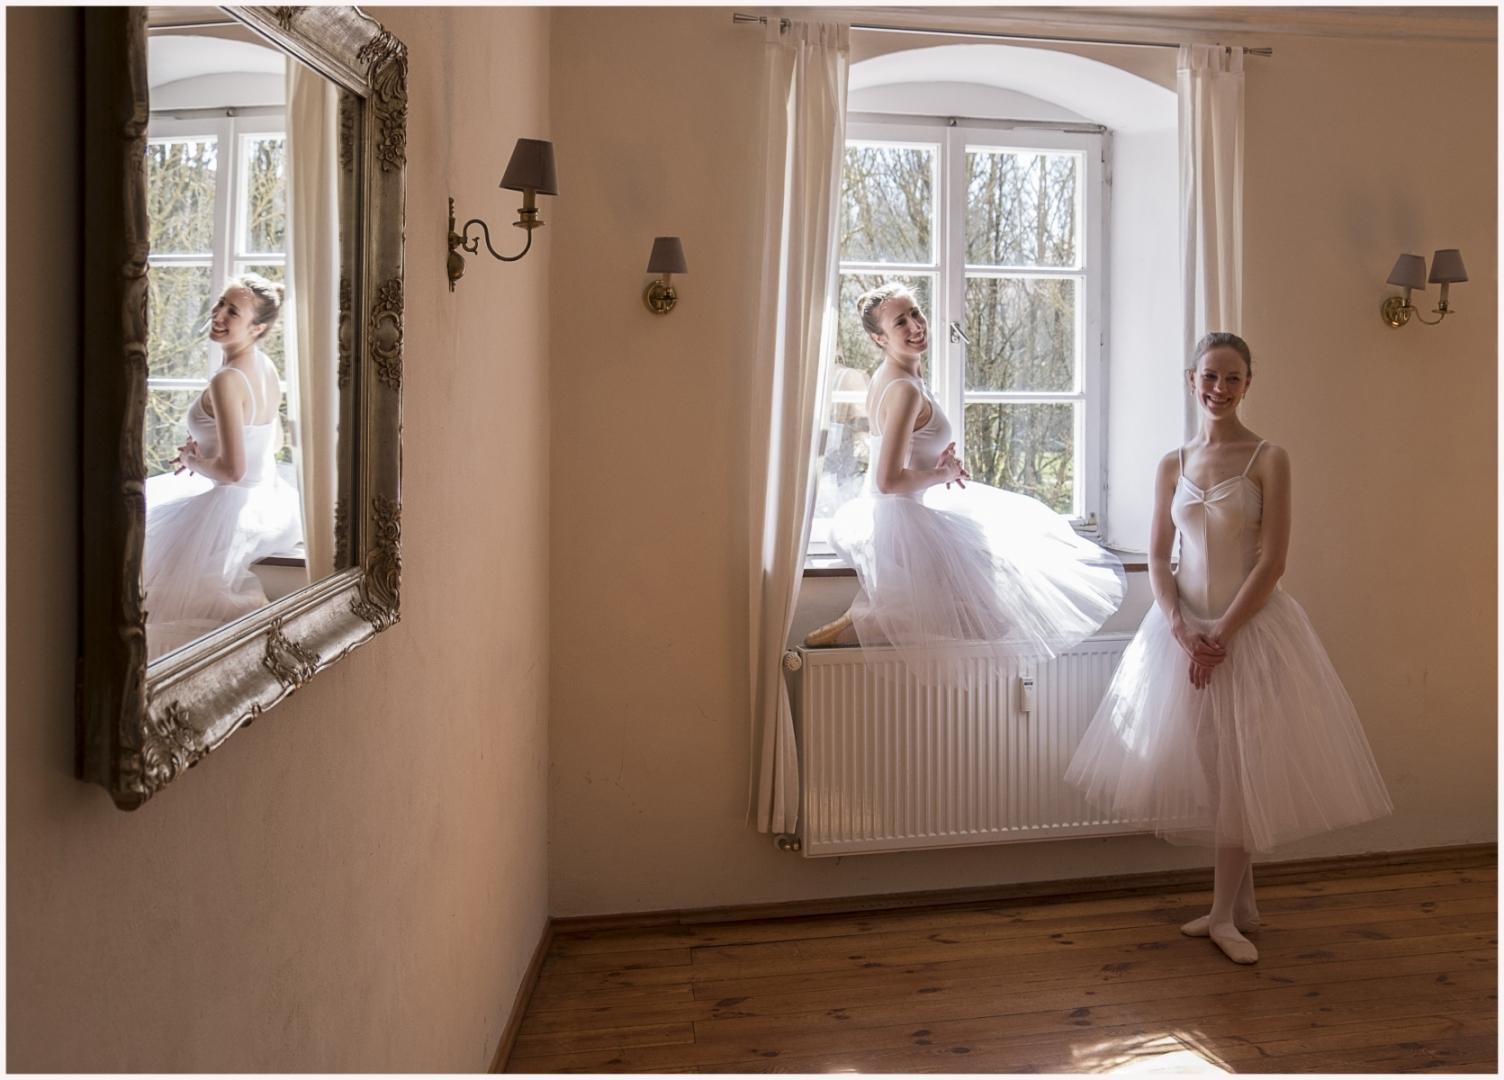 030-Ballett-250317